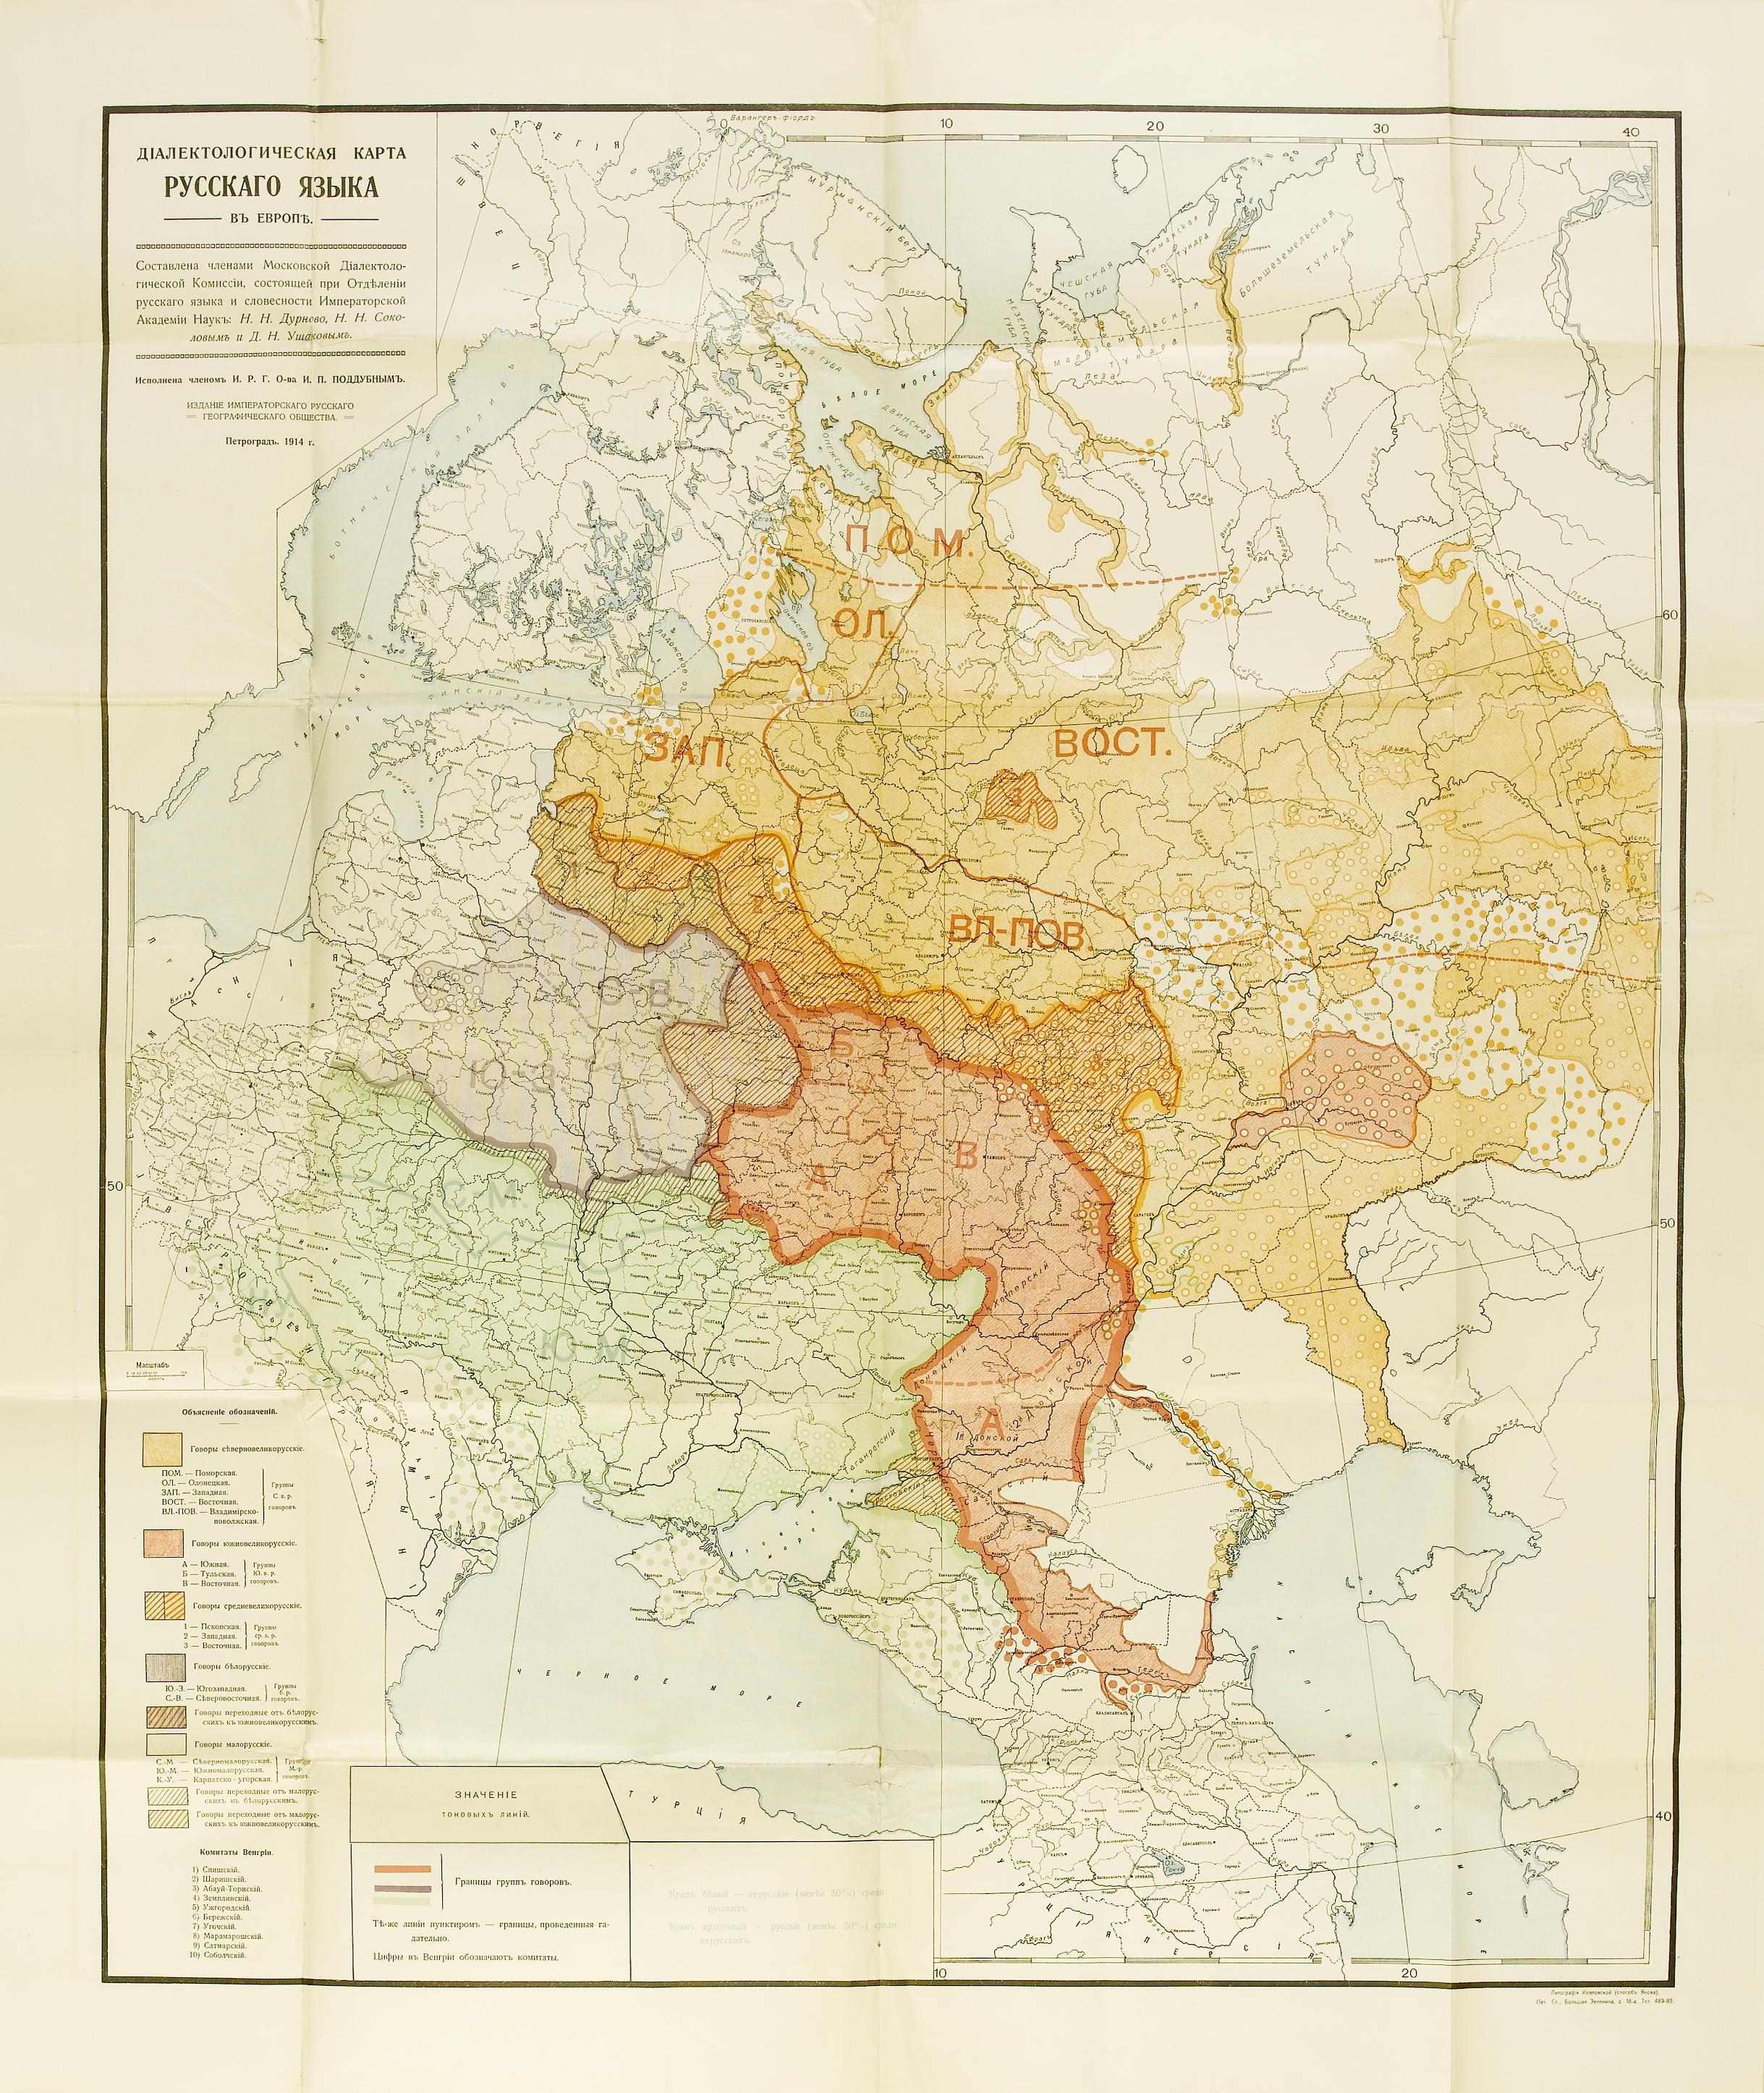 Dialektologicheskaia_Karta_1914_goda